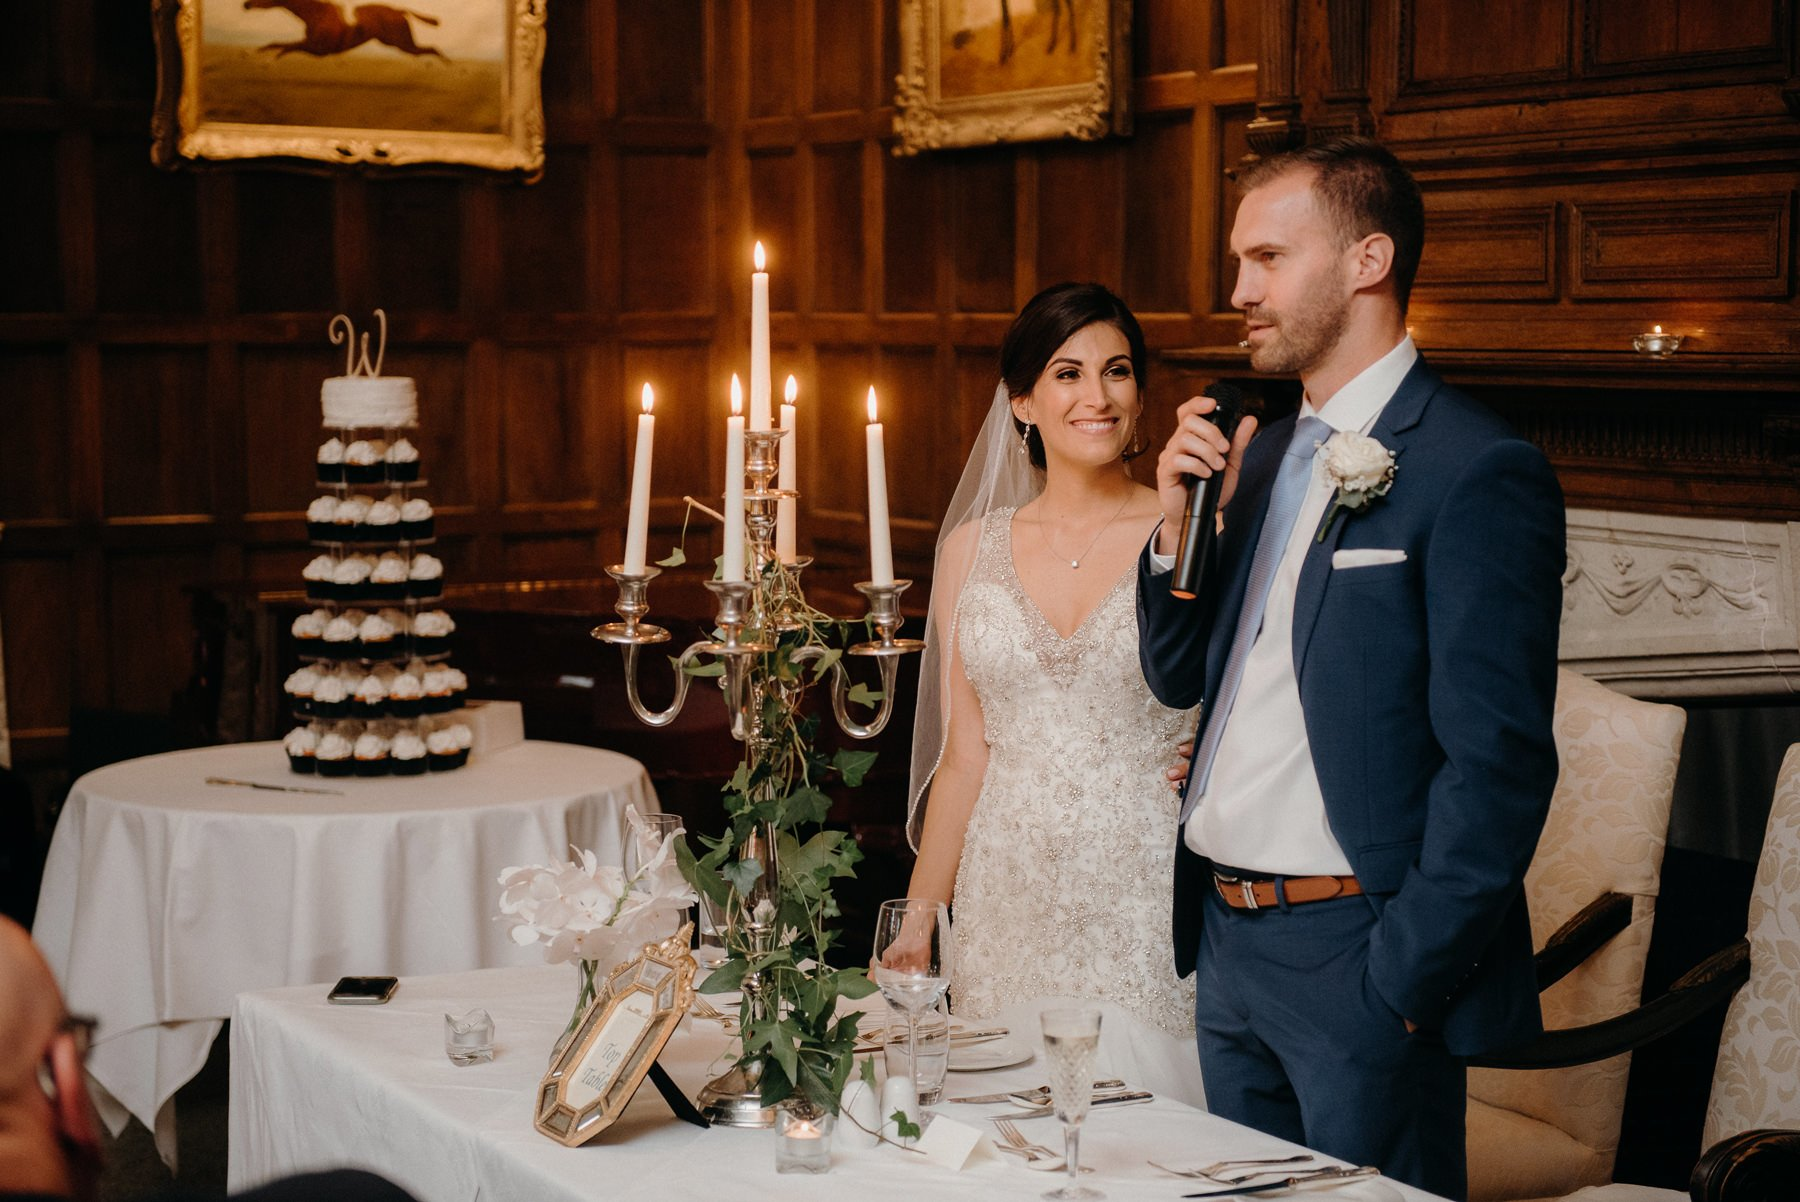 waterford-castle-wedding-speeches